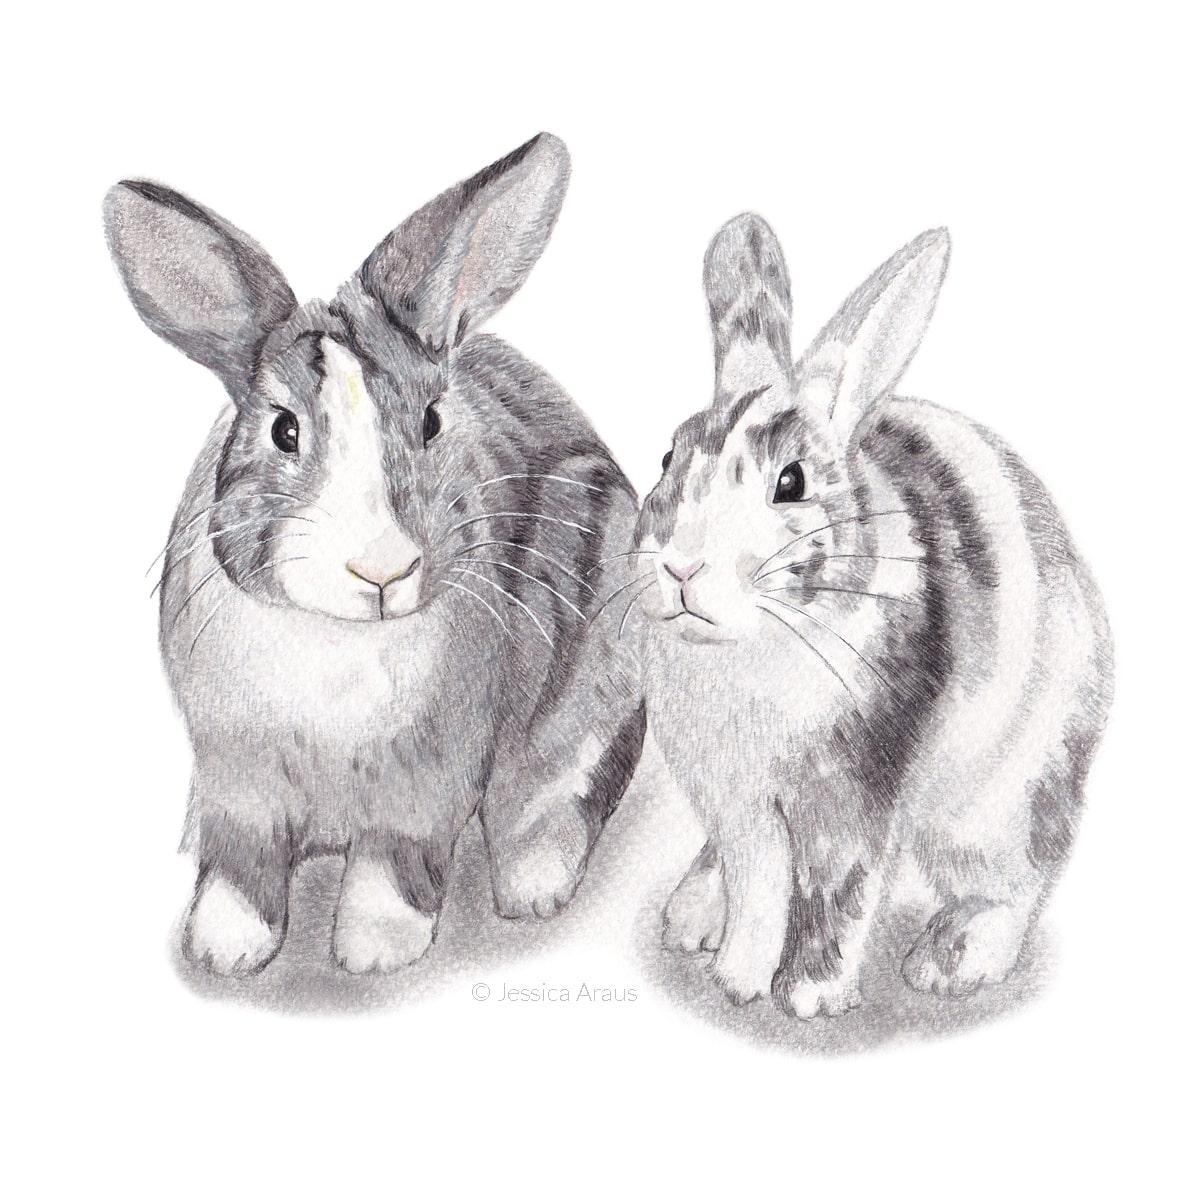 Rabbits Illustration